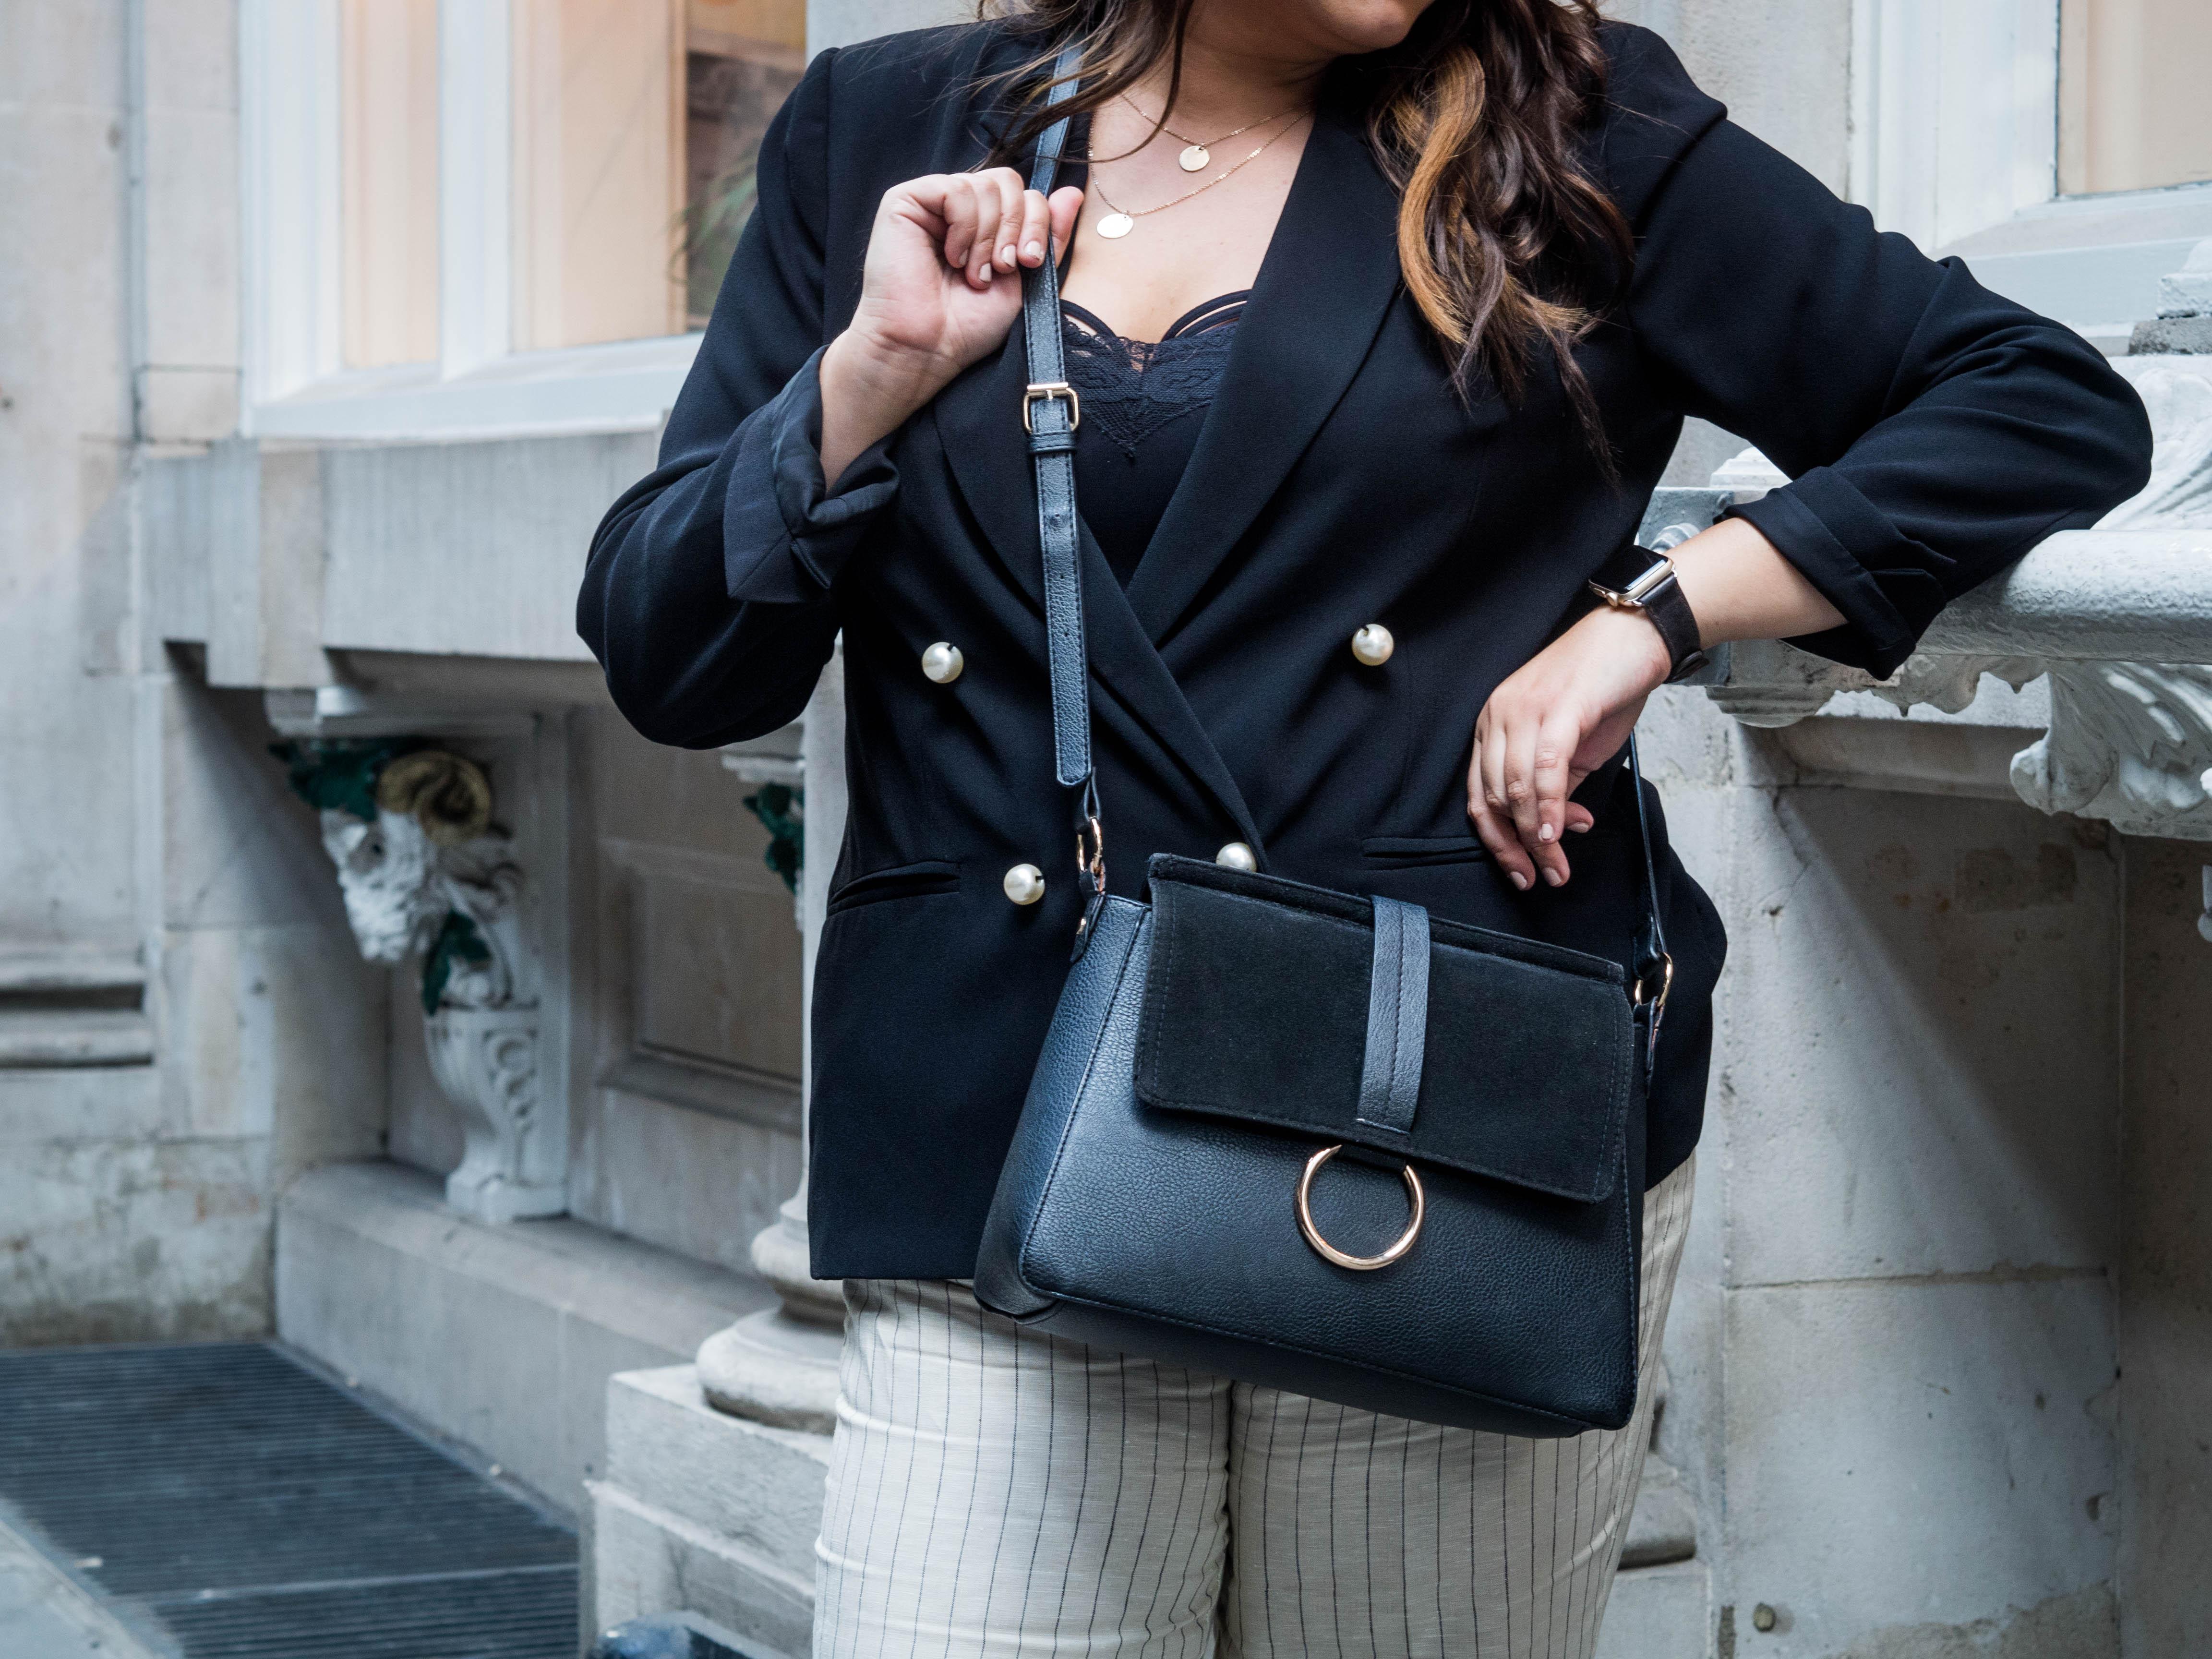 Pearl Jacket, Mango Culottes, Chanel slingbacks outfit fashion